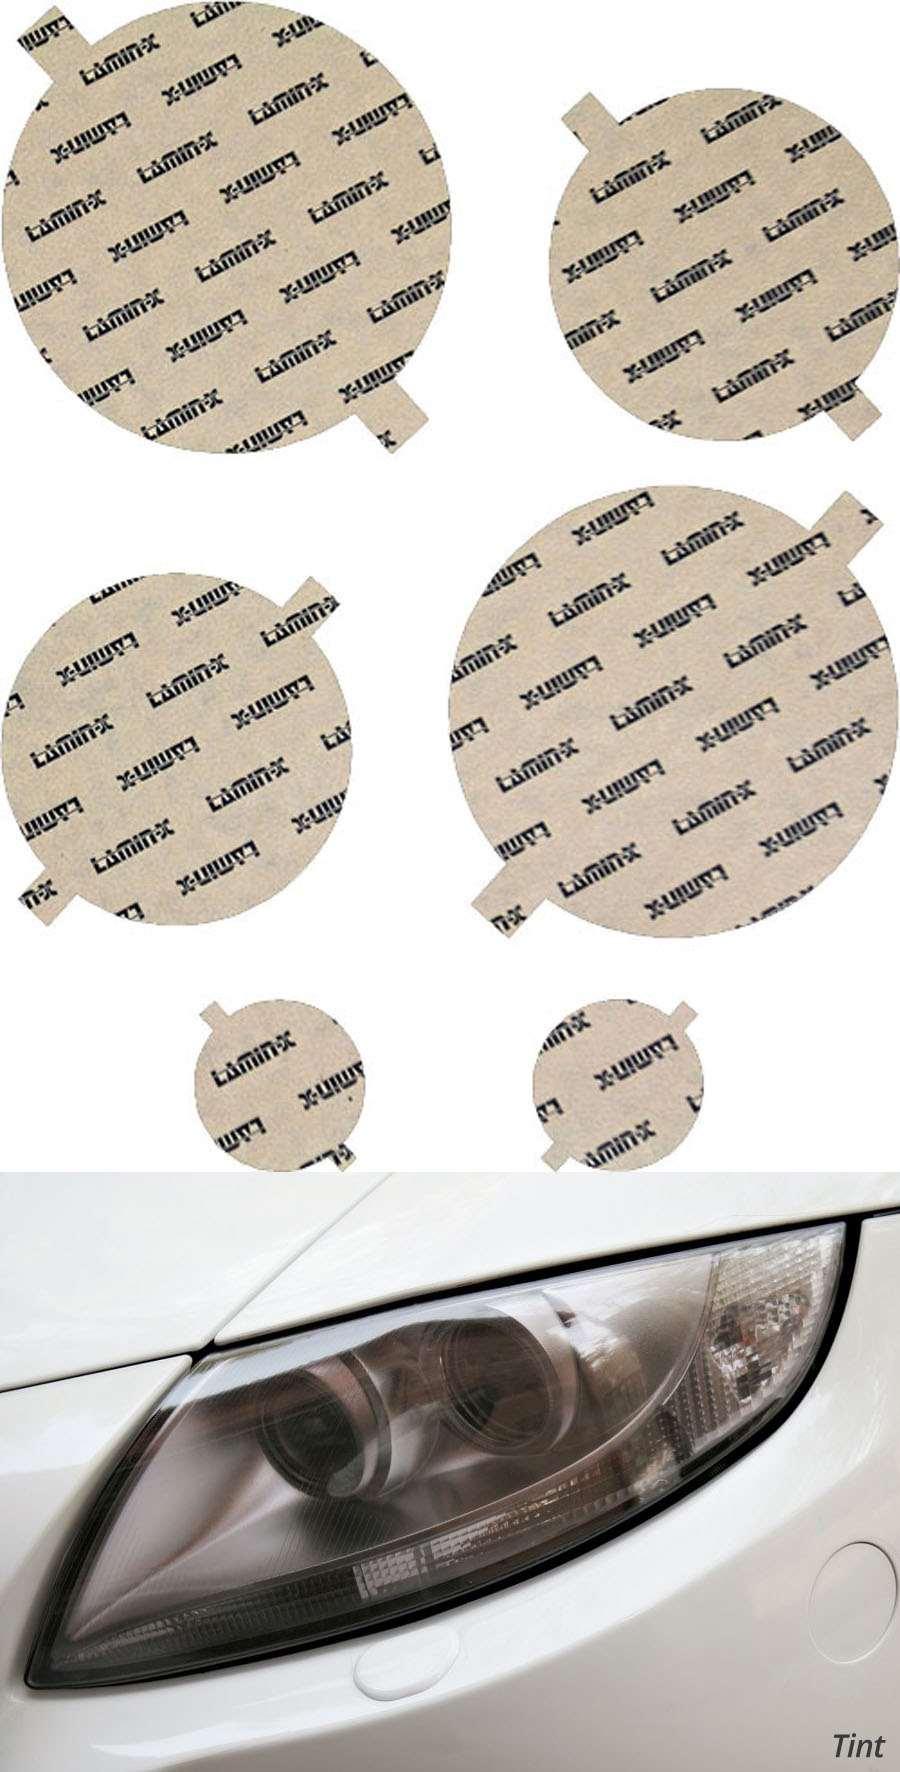 Jaguar S-Type/R 05-08 Tint Headlight Covers Lamin-X JG501T